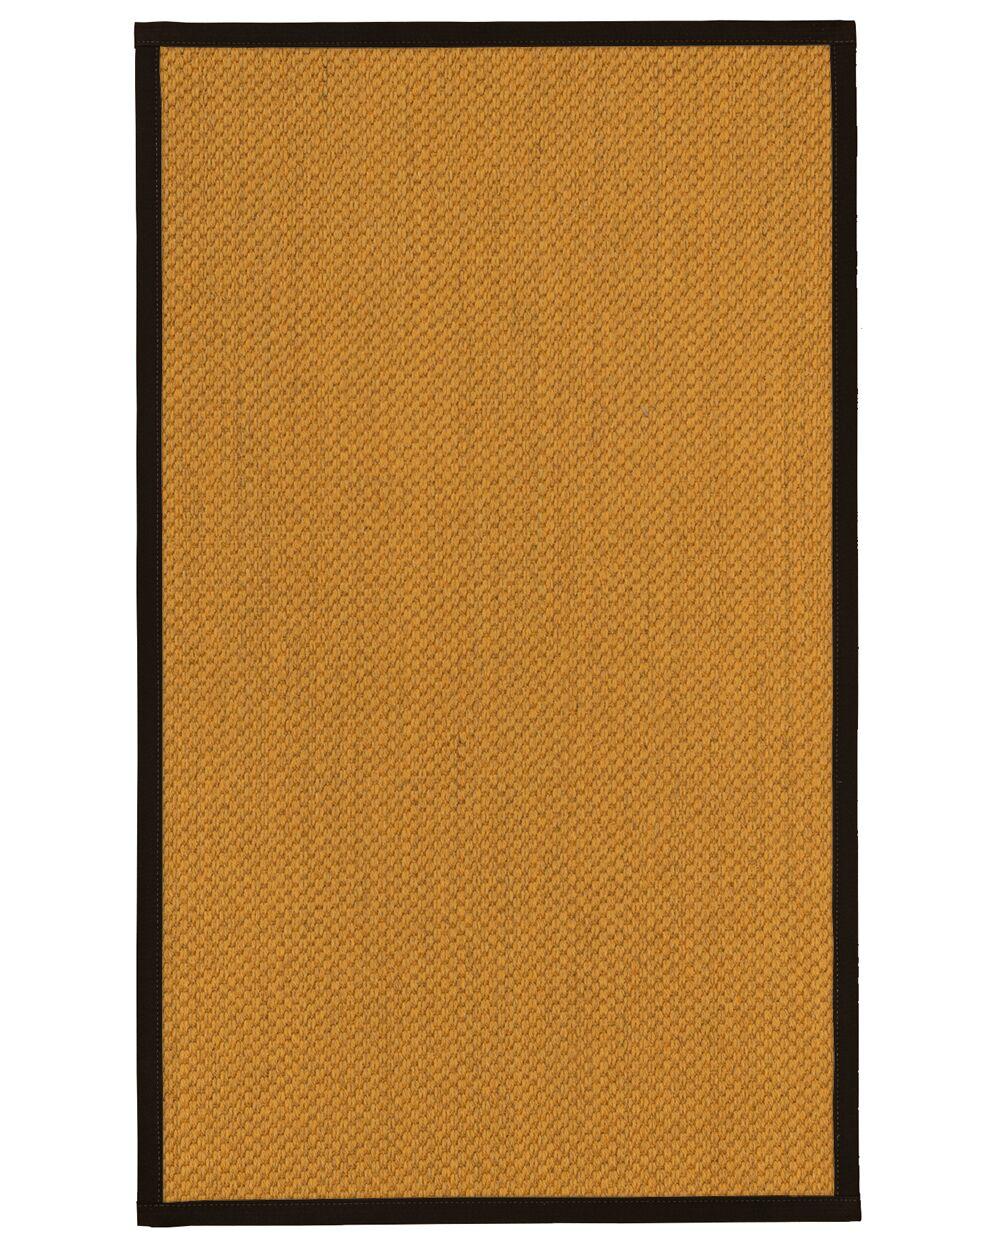 Aella Handwoven Beige Area Rug Rug Size: Rectangle 5' x 8'